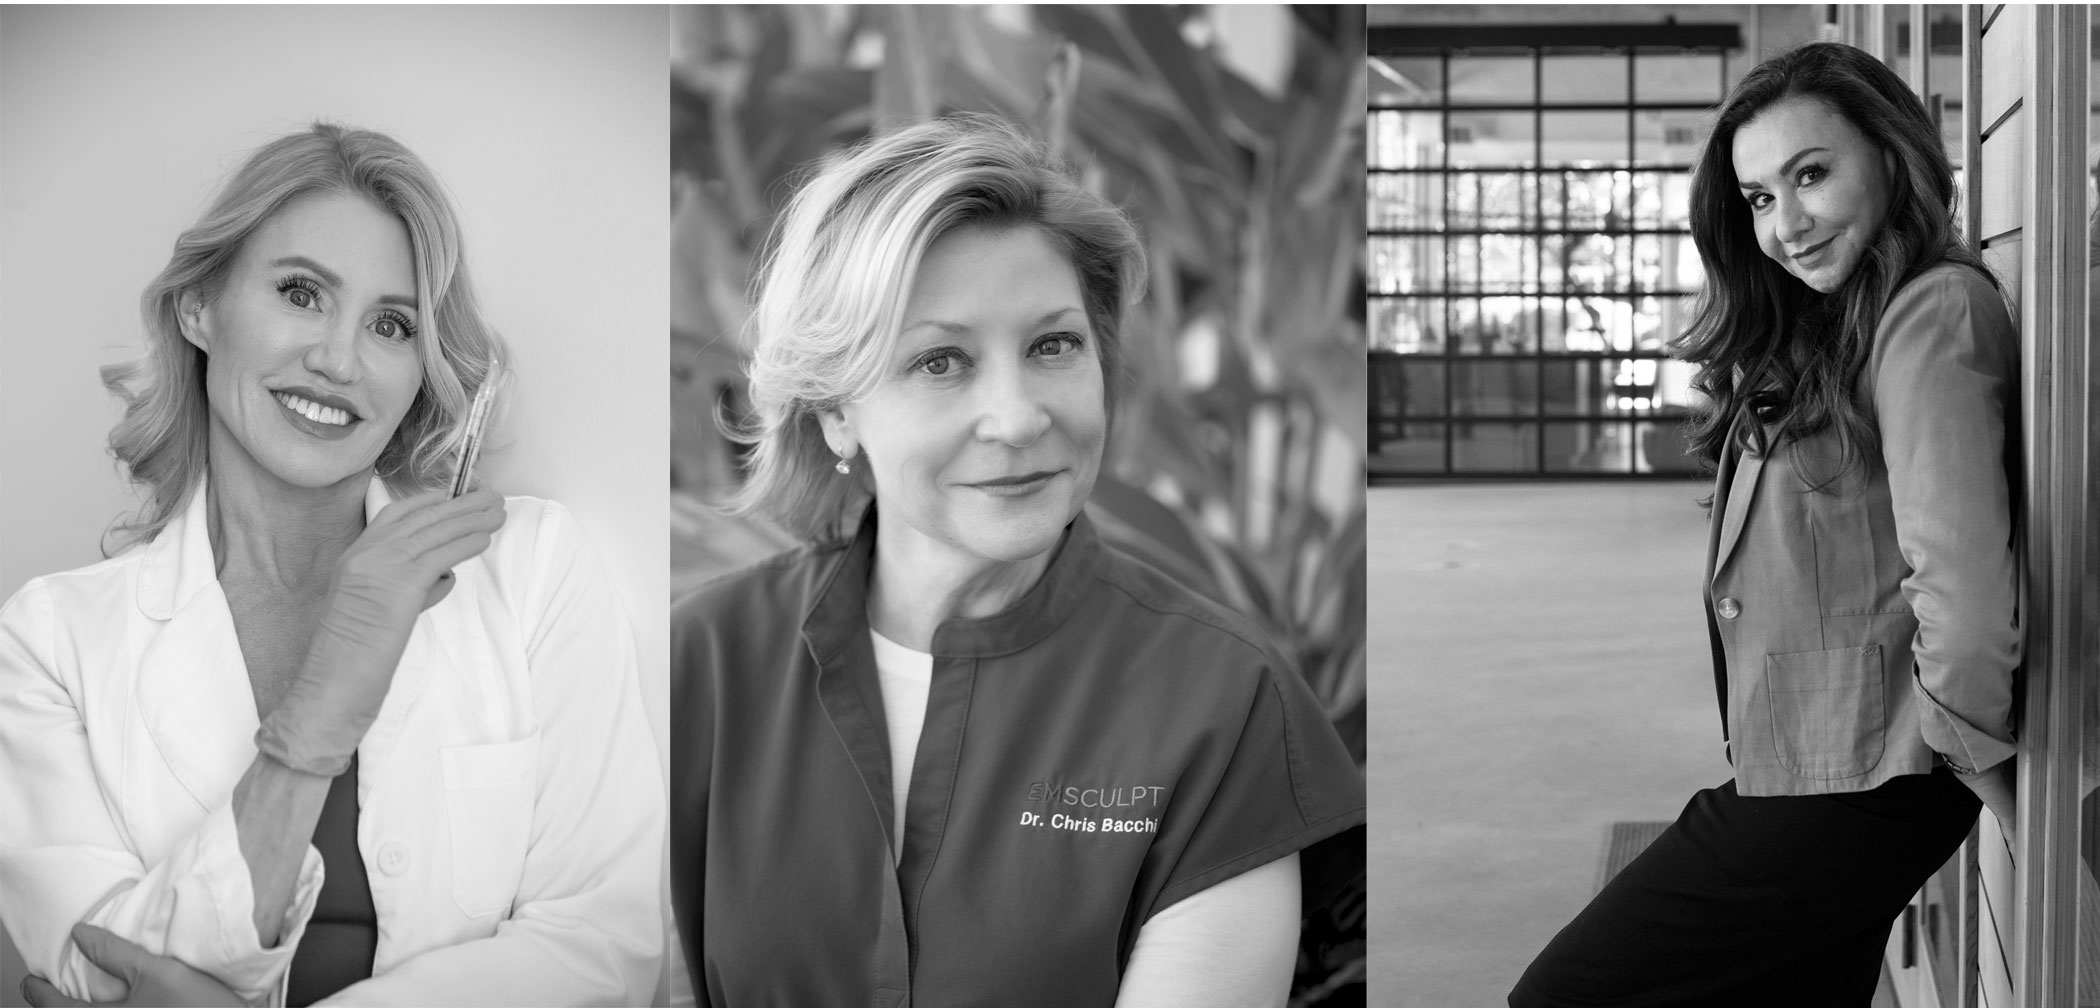 Doctors Karron L. Power, Chris Bacchi, and Faye Jamali